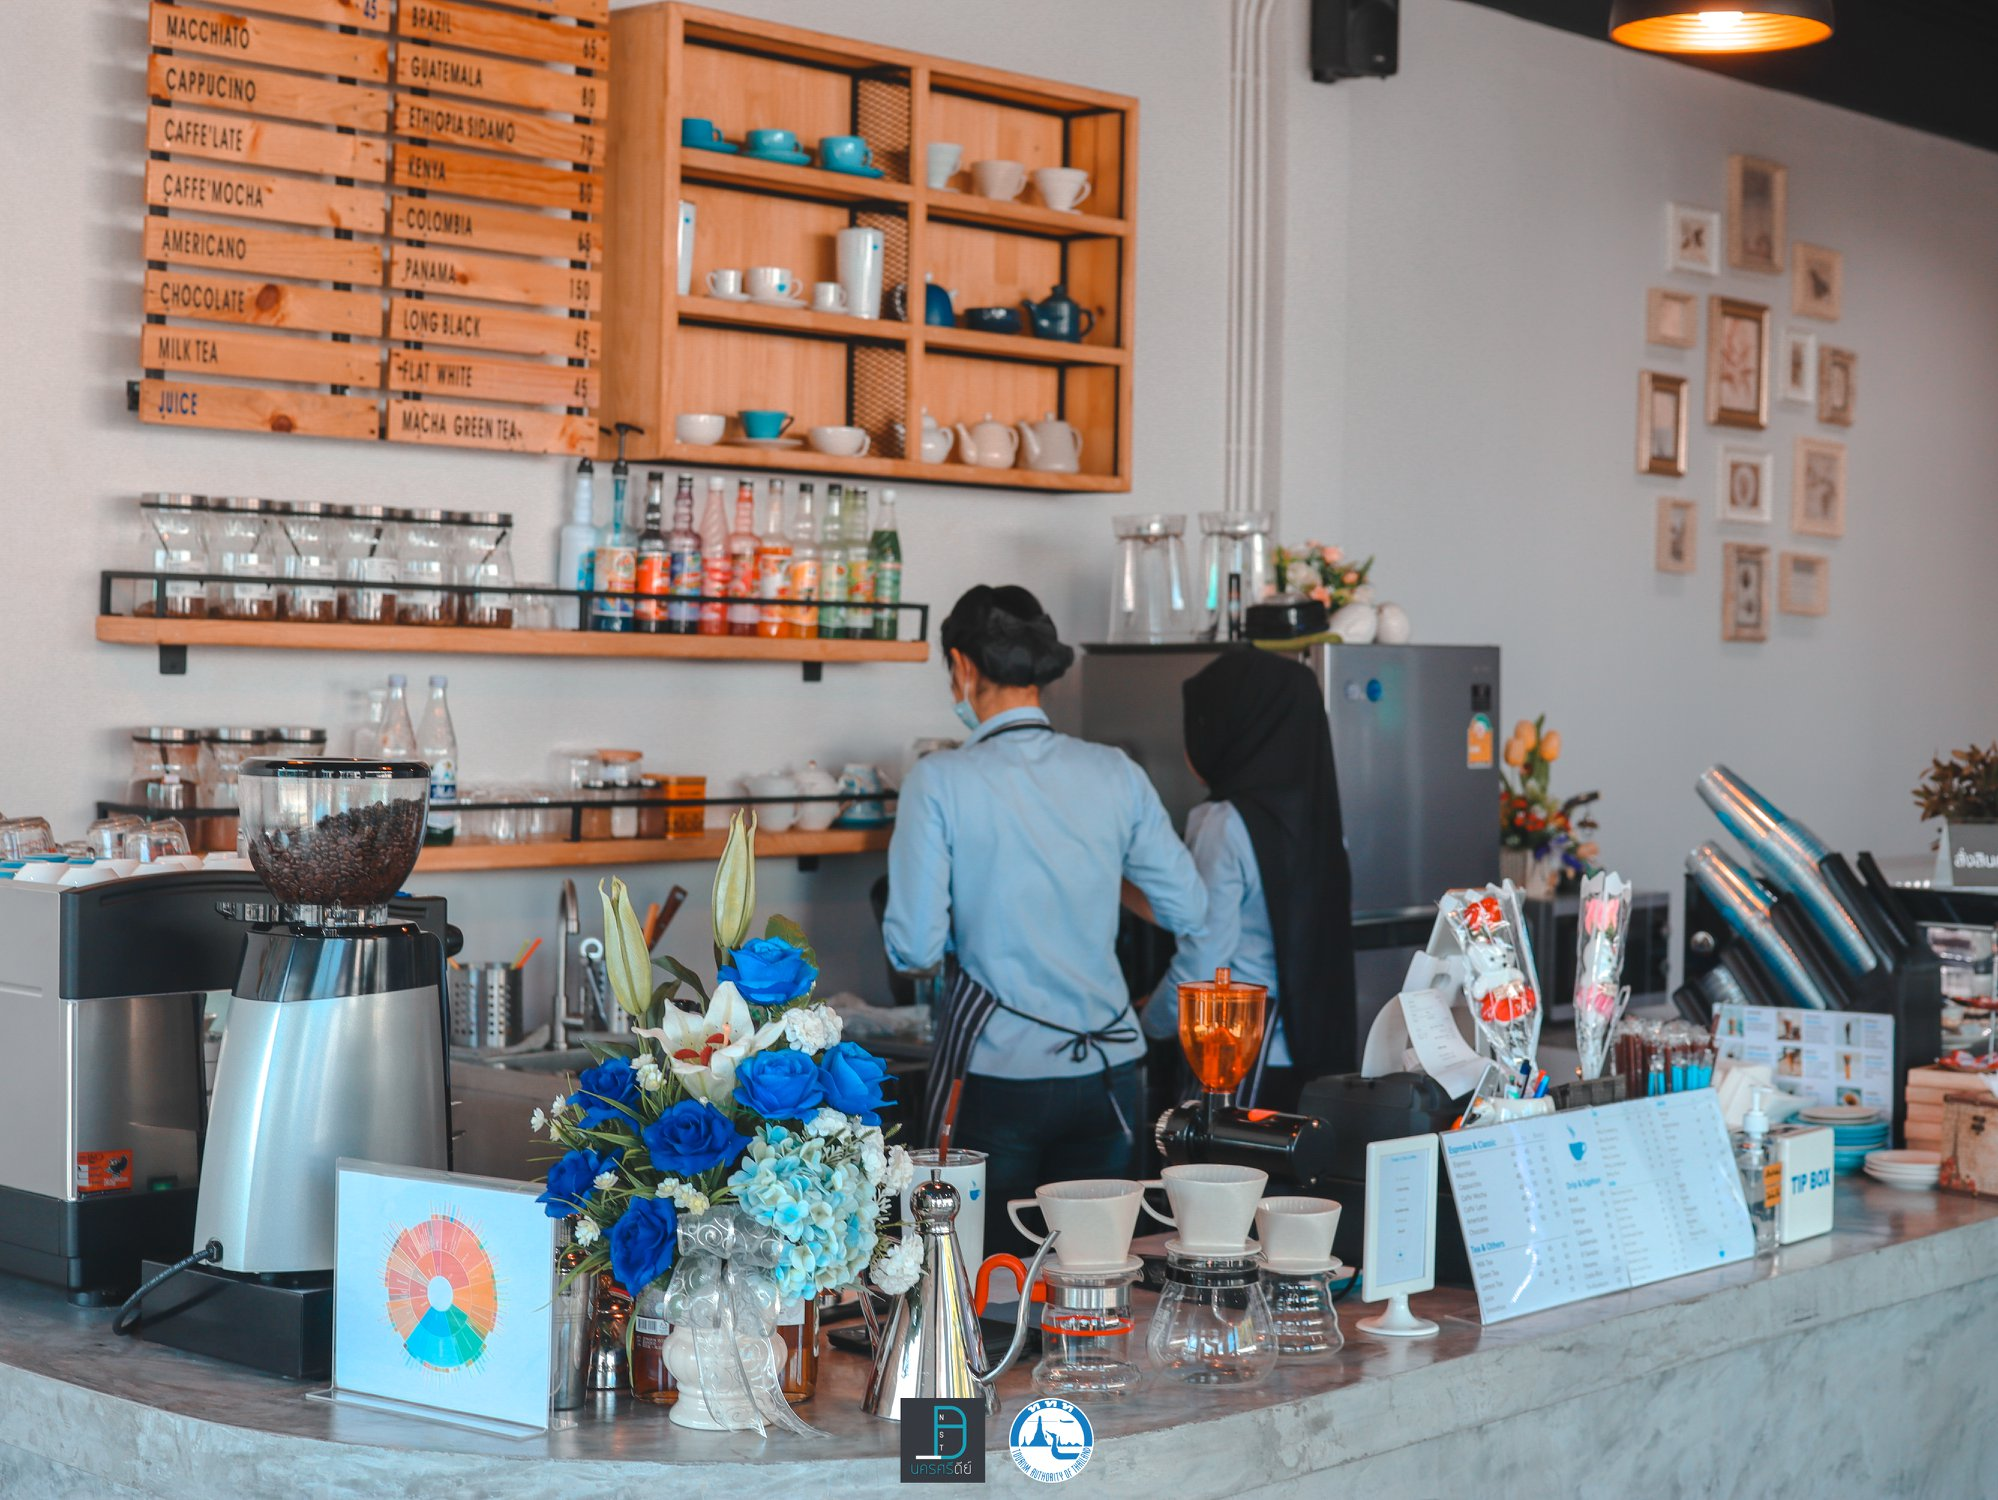 7. Blue Cup Coffee คาเฟ่โทนสีฟ้าปนขาว สไตล์มินิมอล บรรยากาศร้านสบายๆ เหมาะสำหรับนั่งชิว อ่านหนังสือนั่งเล่นได้ยาวๆกันเลยทีเดียวคาเฟ่,สตูล,เด็ด,จุดเช็คอิน,อร่อย,ร้านอาหาร,จุดถ่ายรูป,สถานที่ท่องเที่ยว